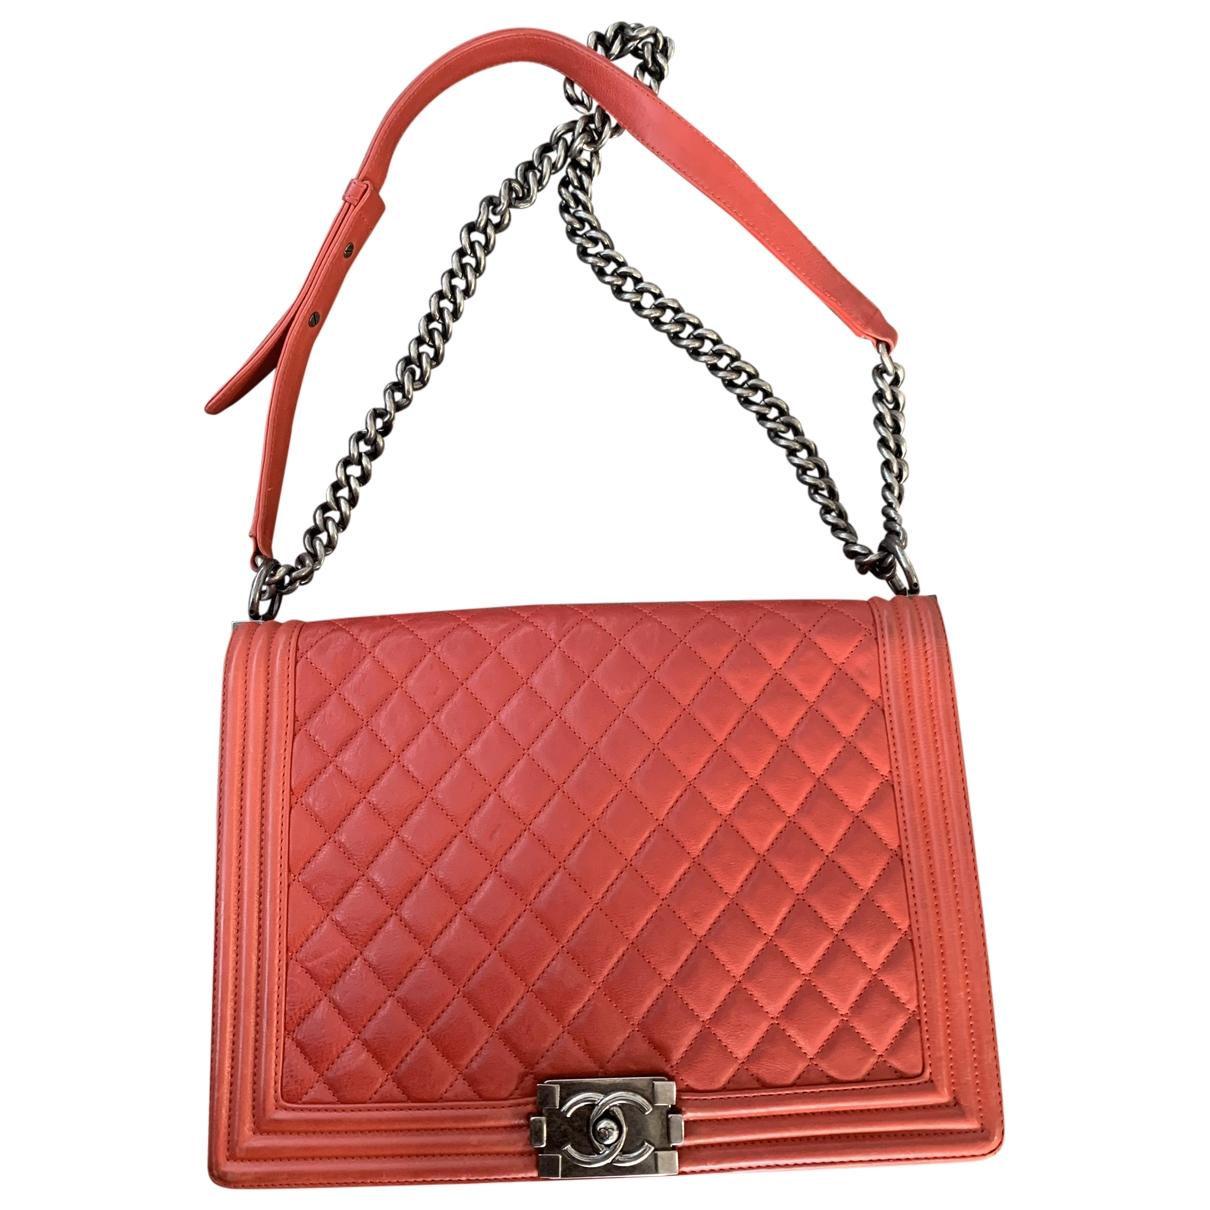 Chanel Boy Handtasche in  Rot Leder